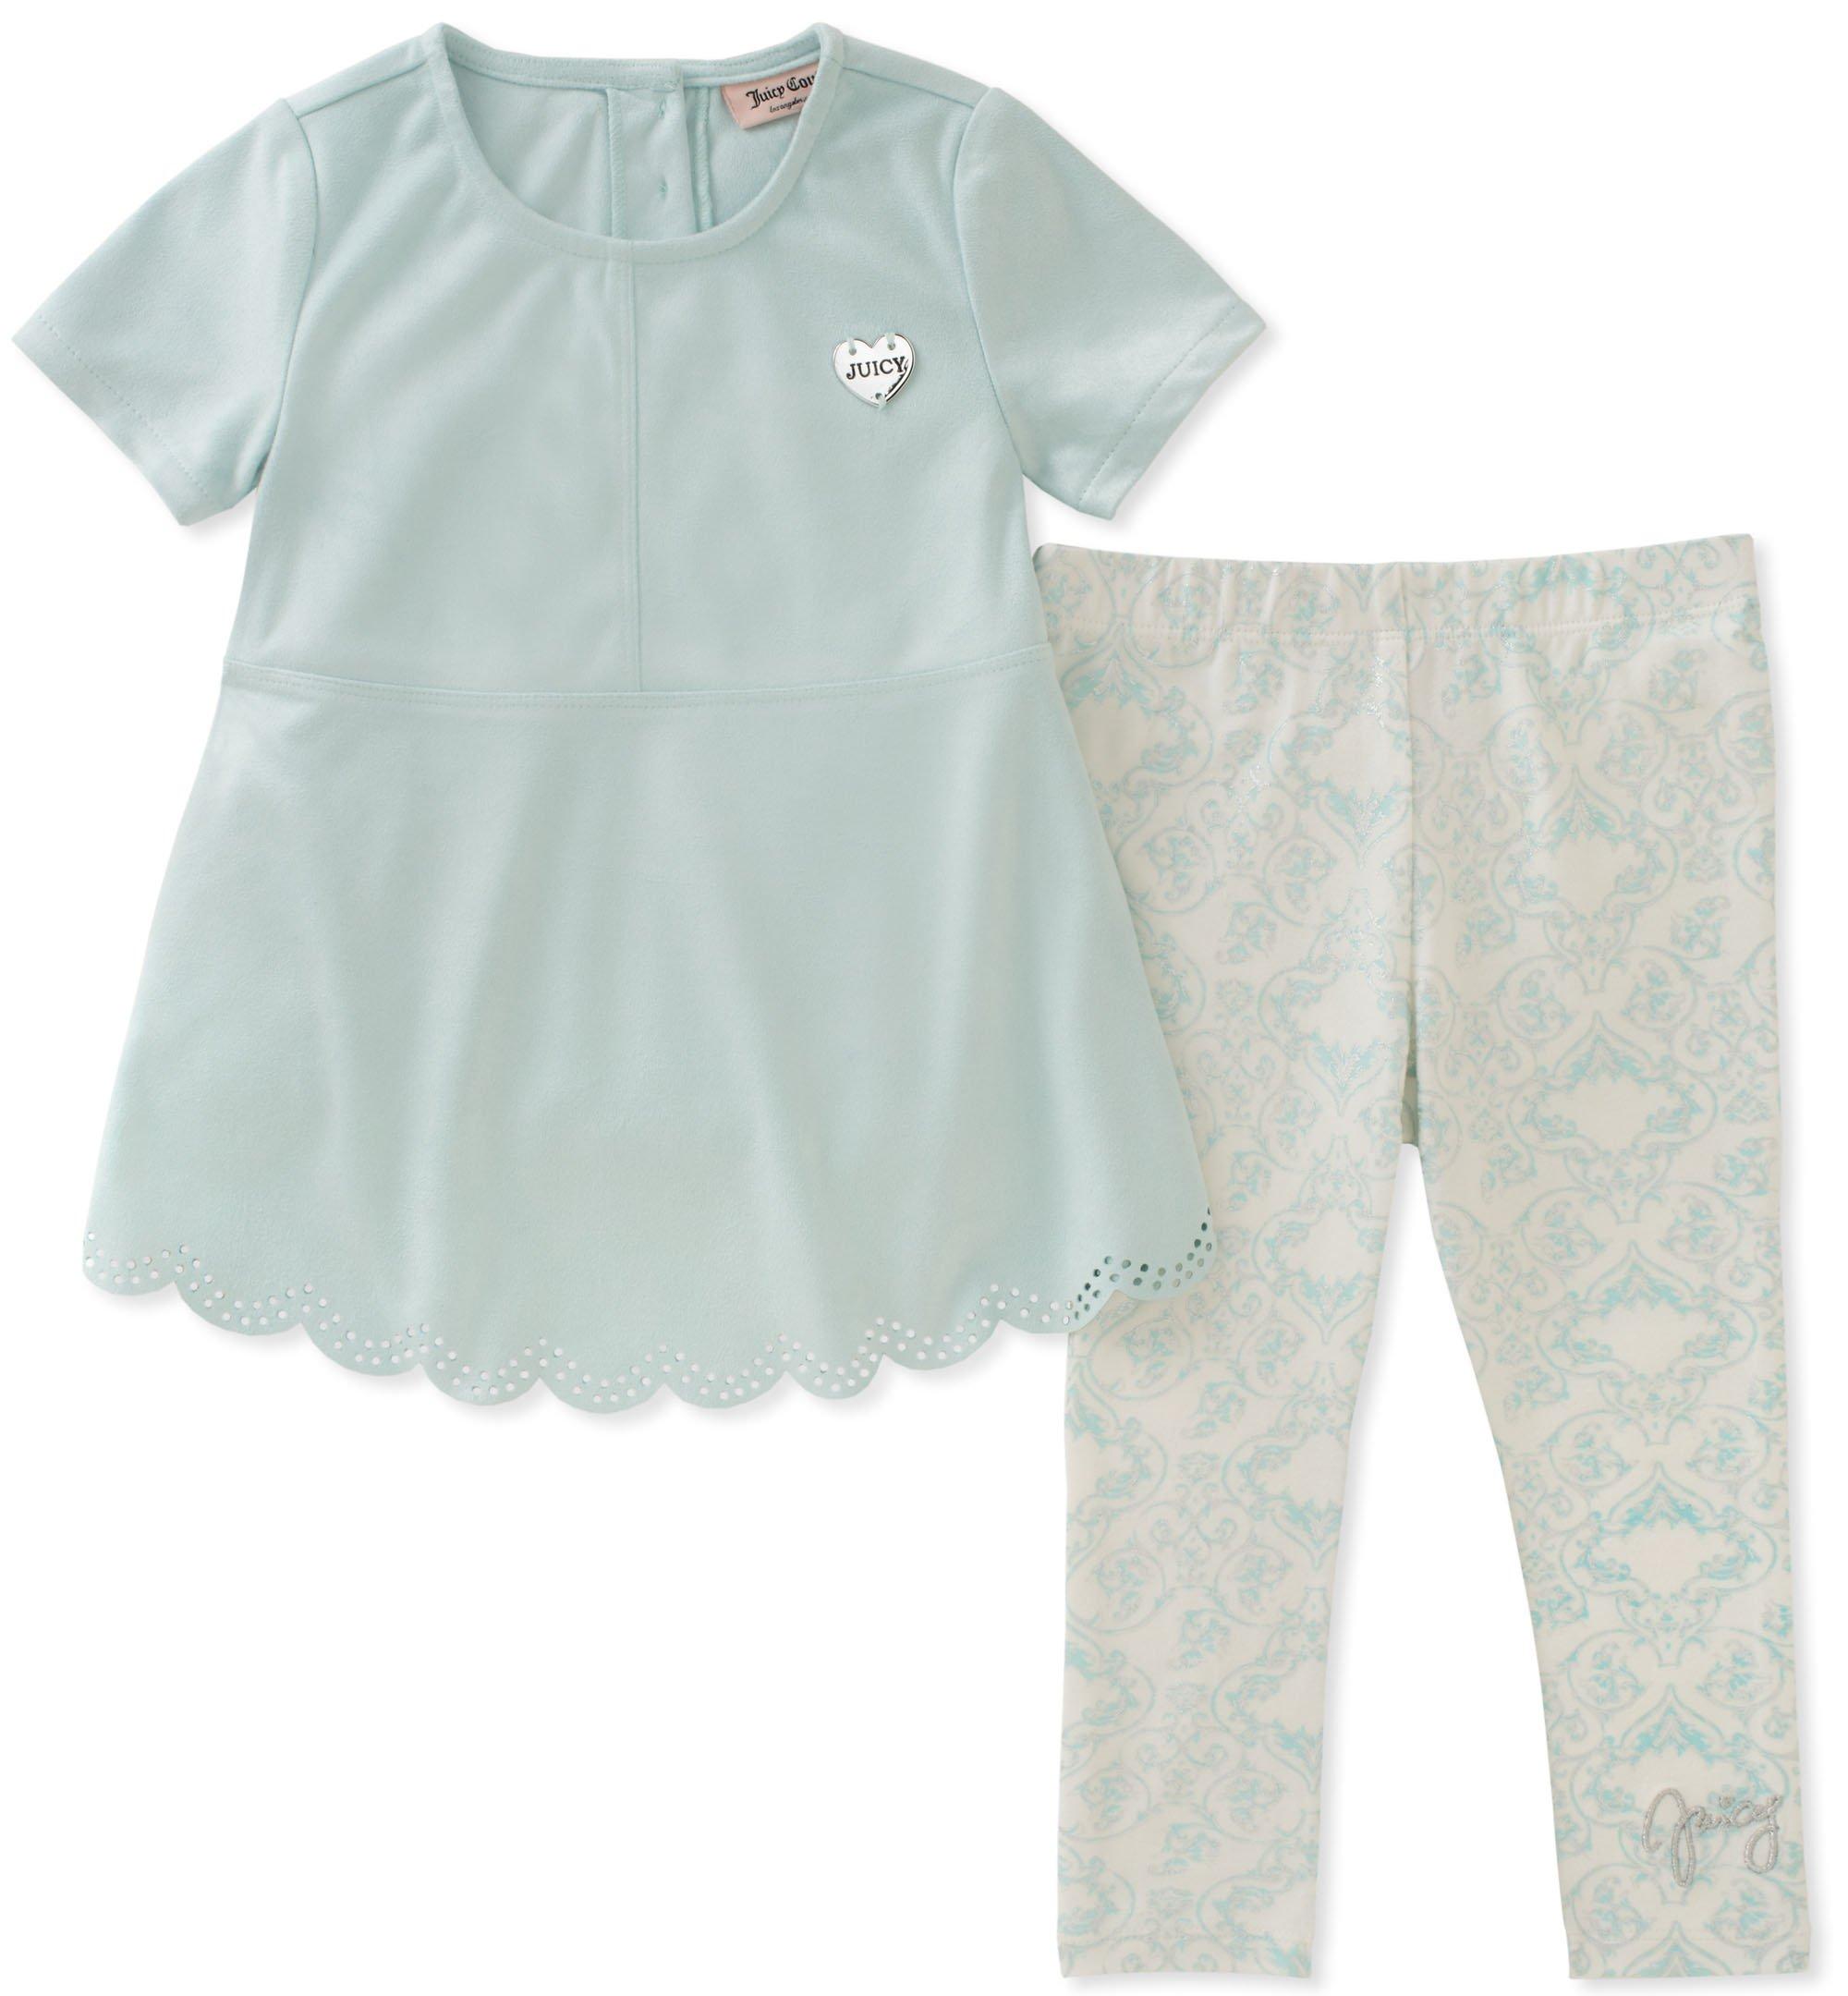 Juicy Couture Girls' Toddler 2 Pieces Tunic Set, Aqua, 2T